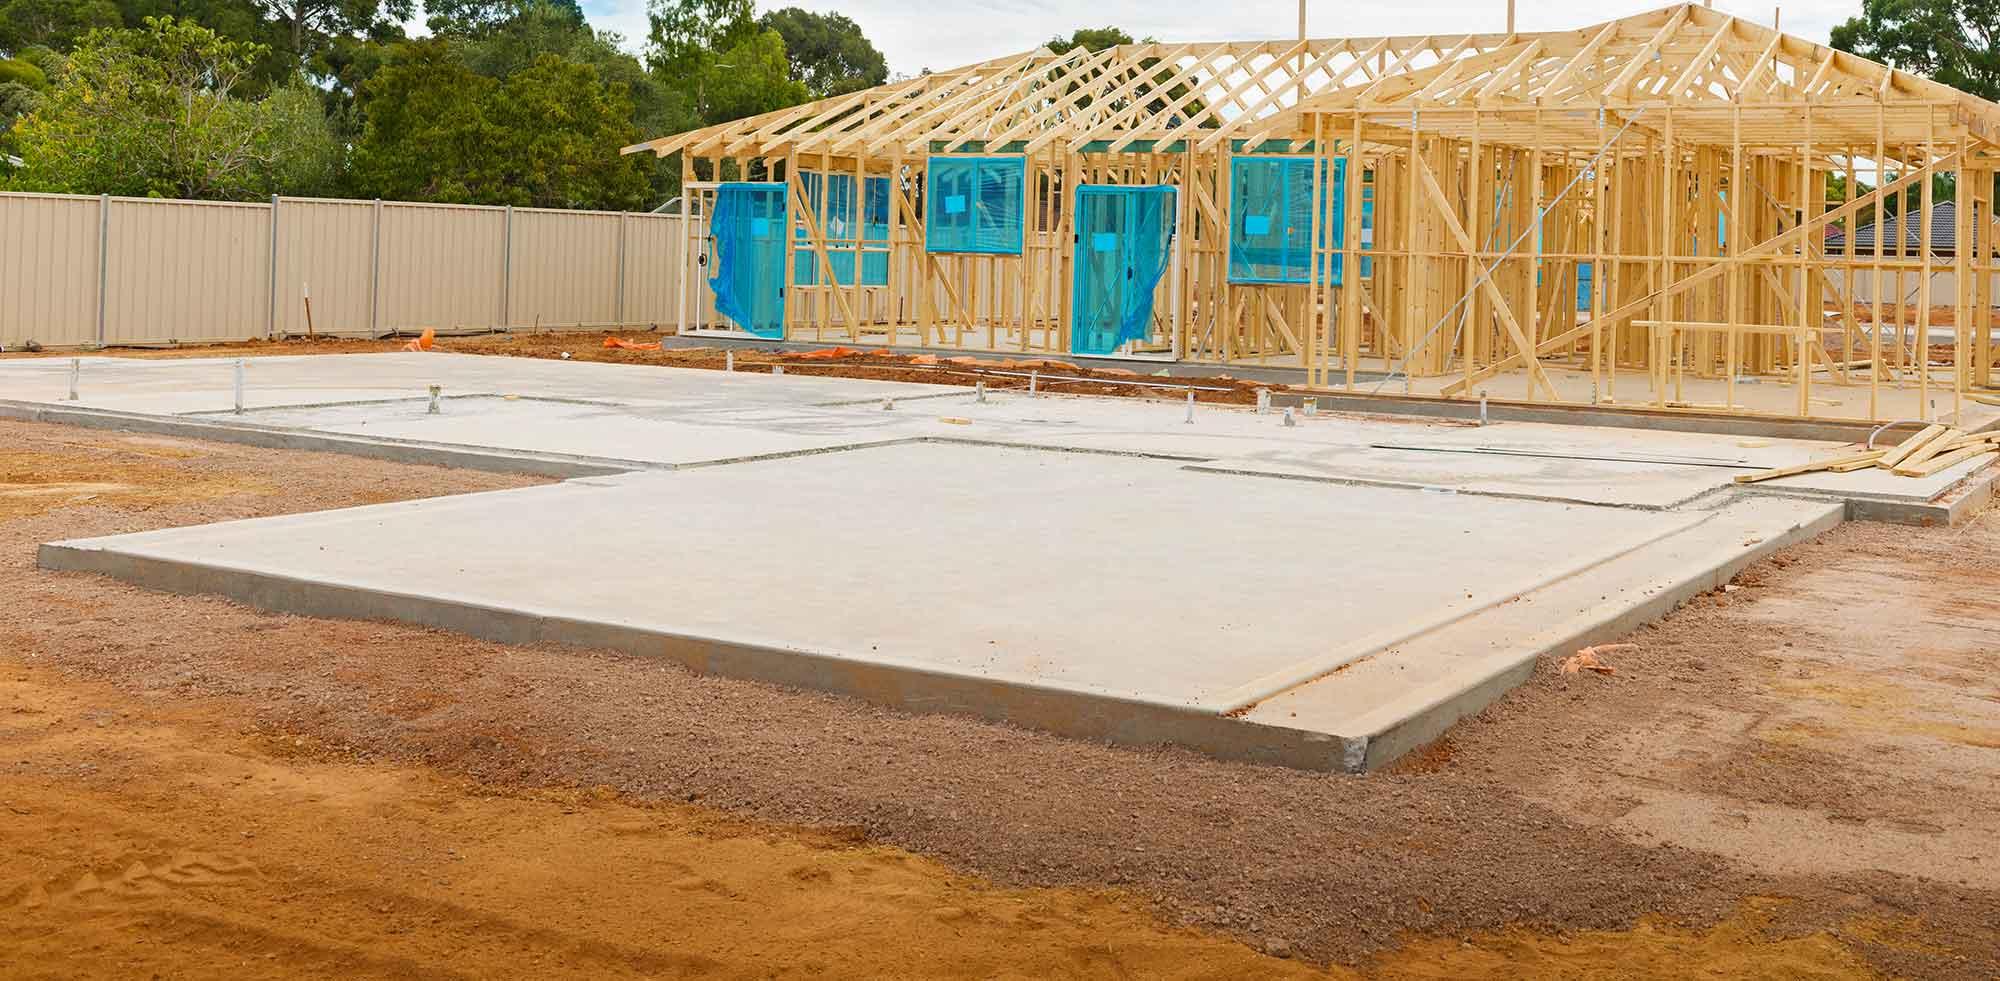 Savannah Concrete Flatwork Contractor in Savannah, GA